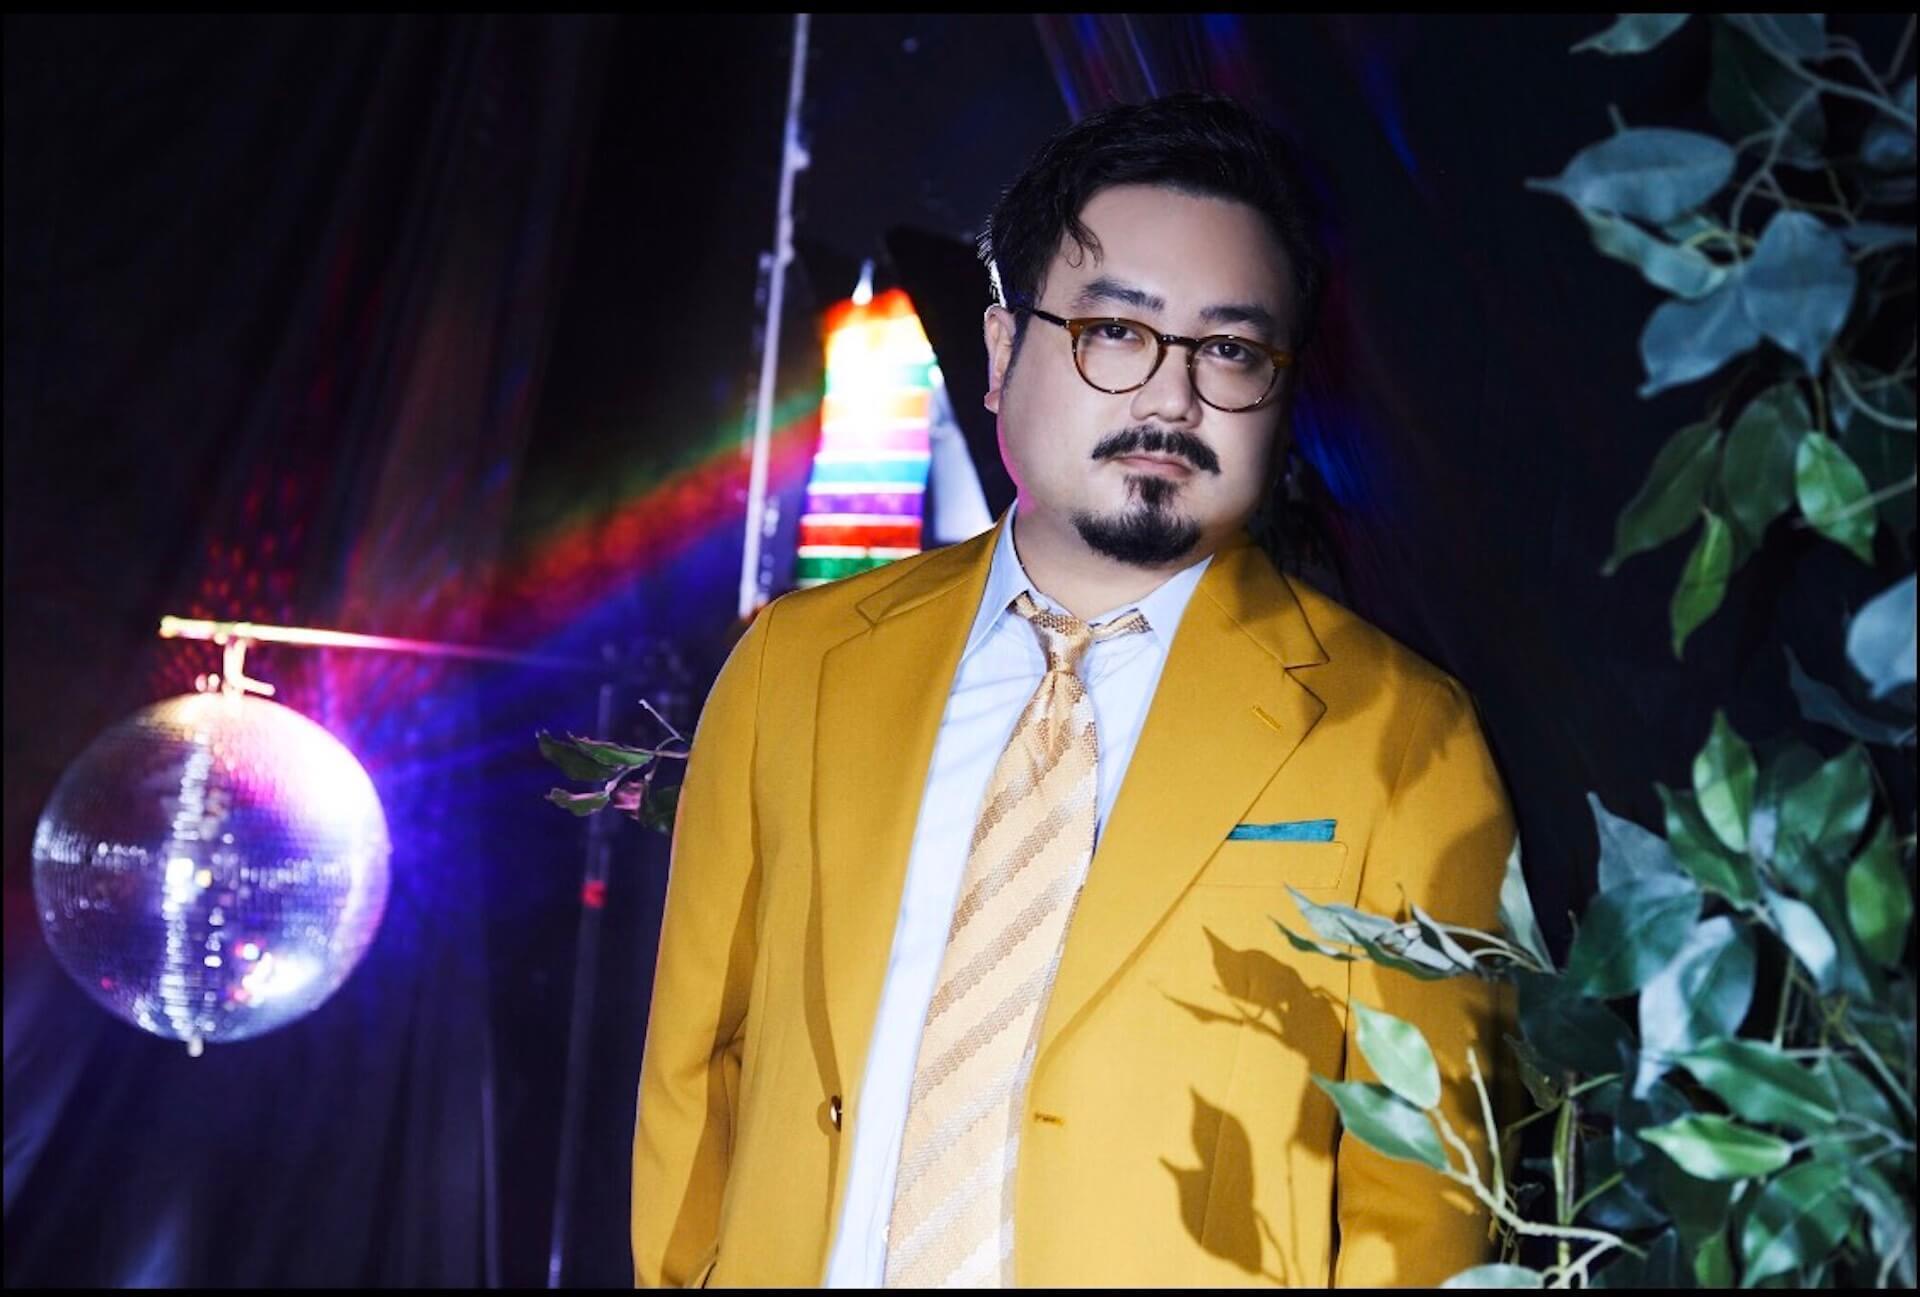 J-WAVE特別番組で m-flo、OKAMOTO'SがNetflix作品を熱く語る!King Gnu常田大希が『攻殻機動隊 SAC_2045』の魅力を紹介するコーナーも art200428_jwave_3